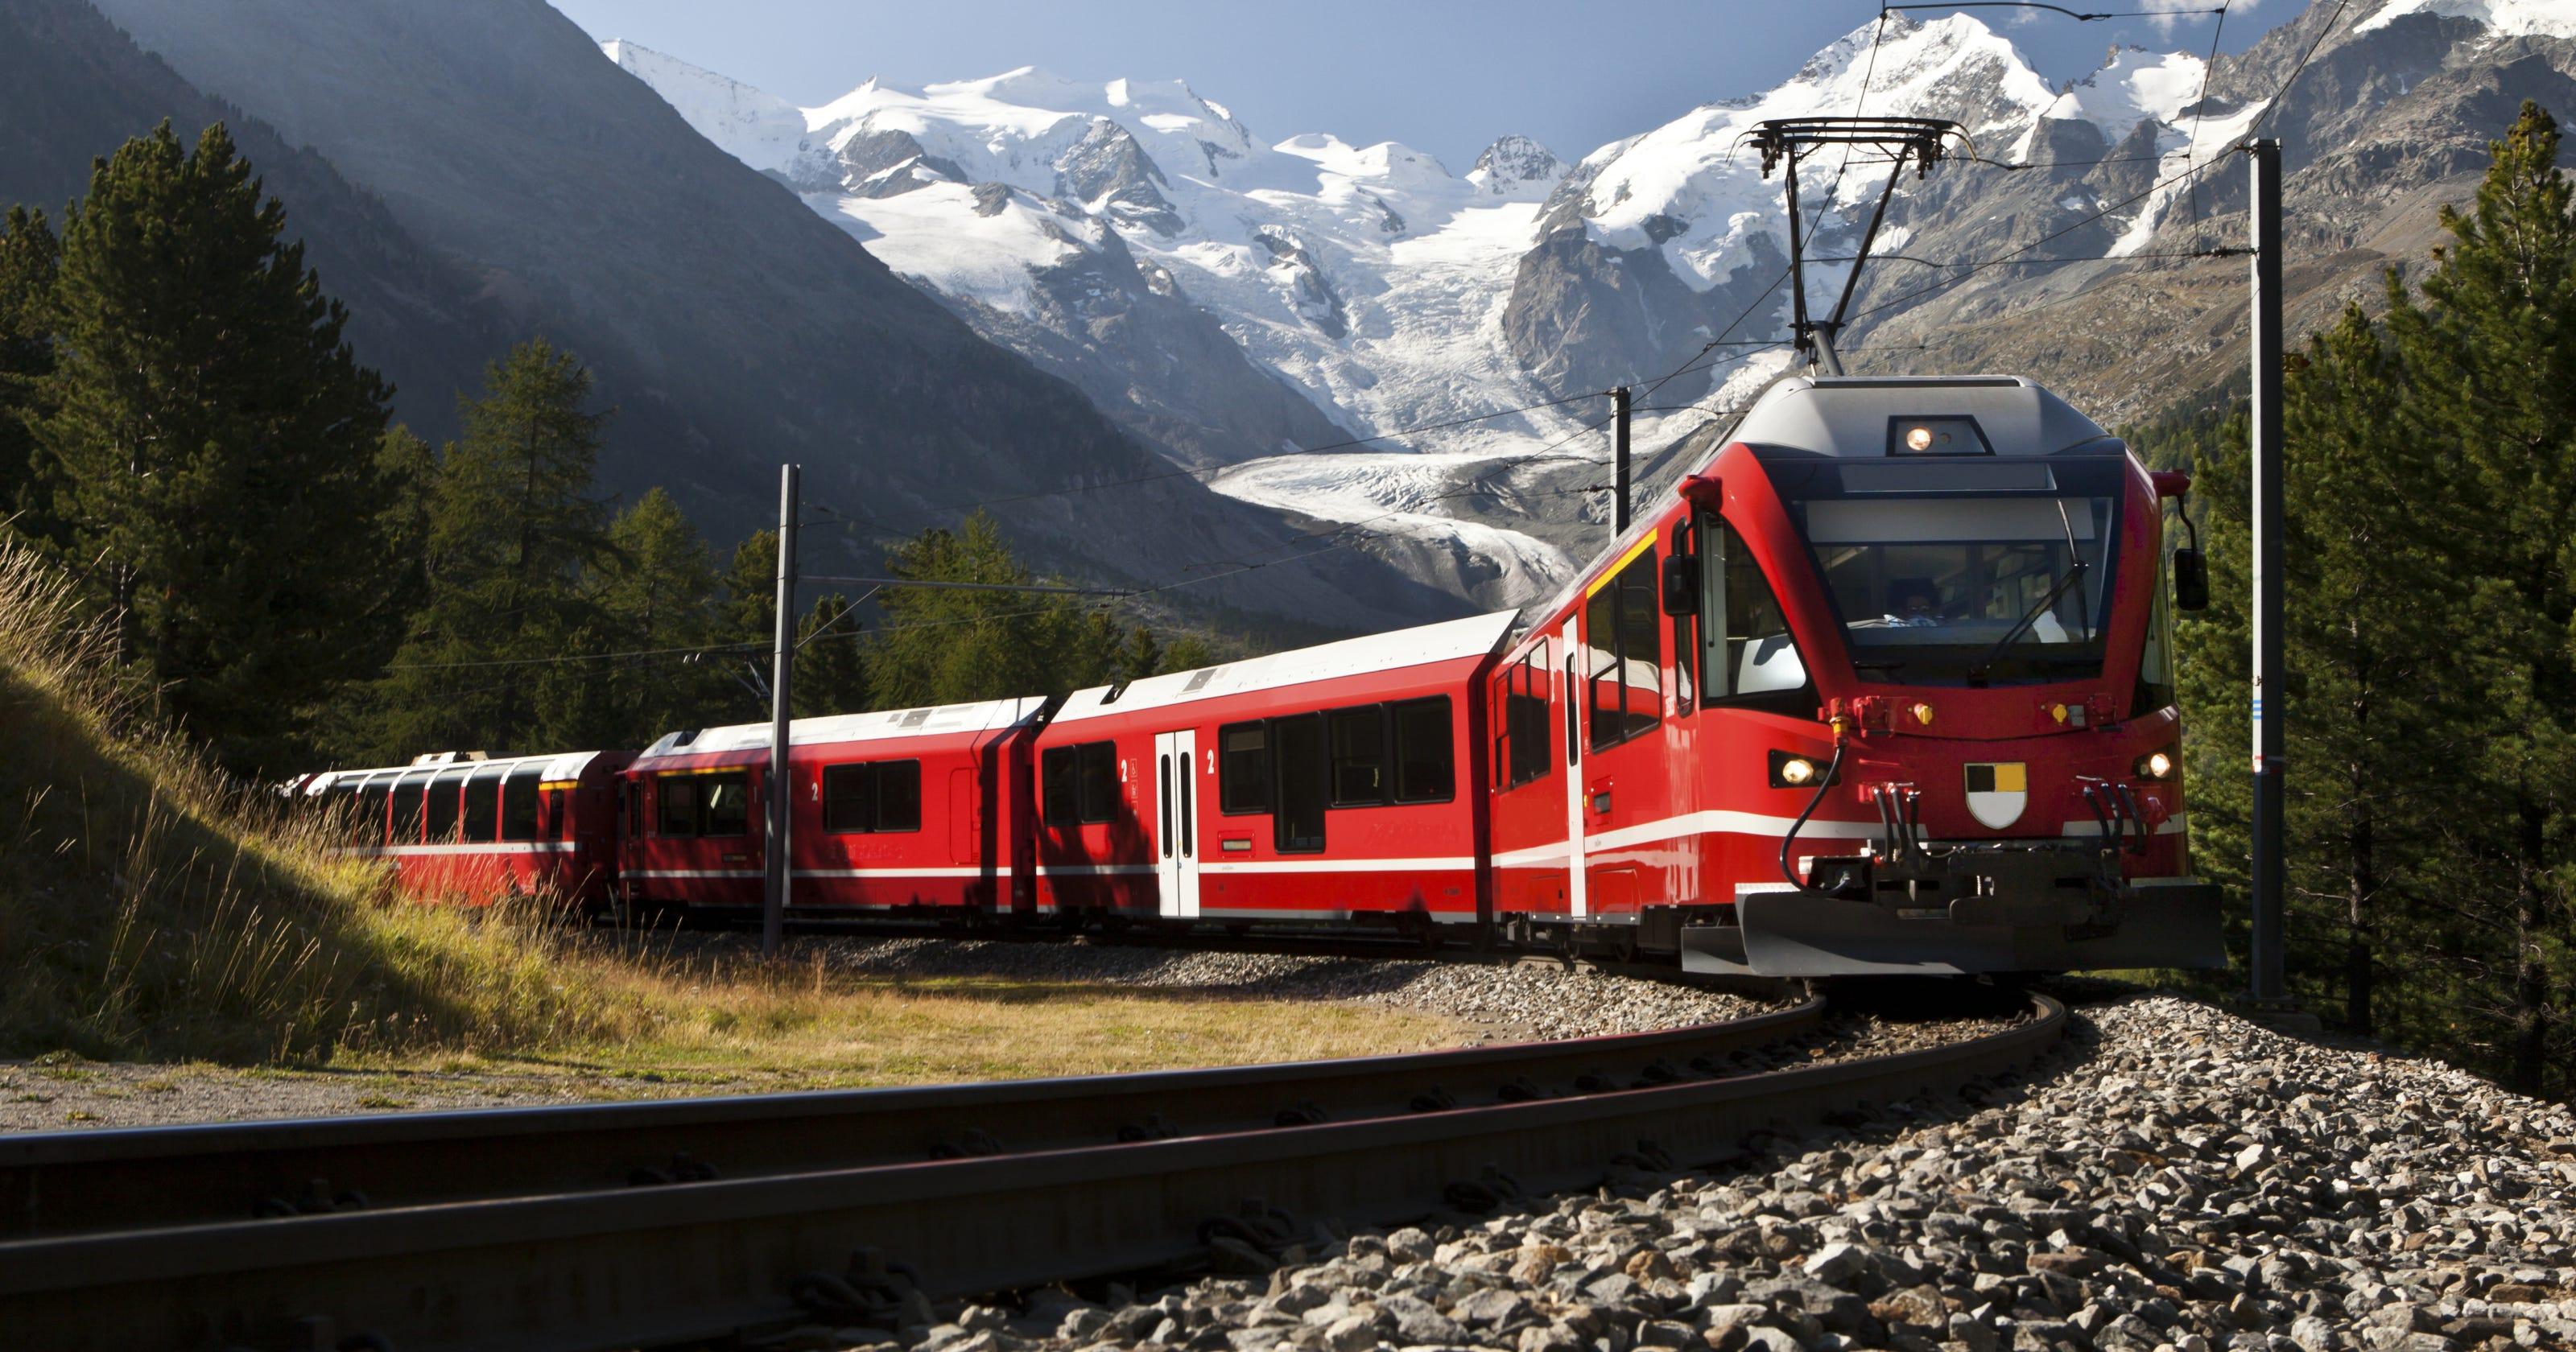 10 essential tips for European train travel